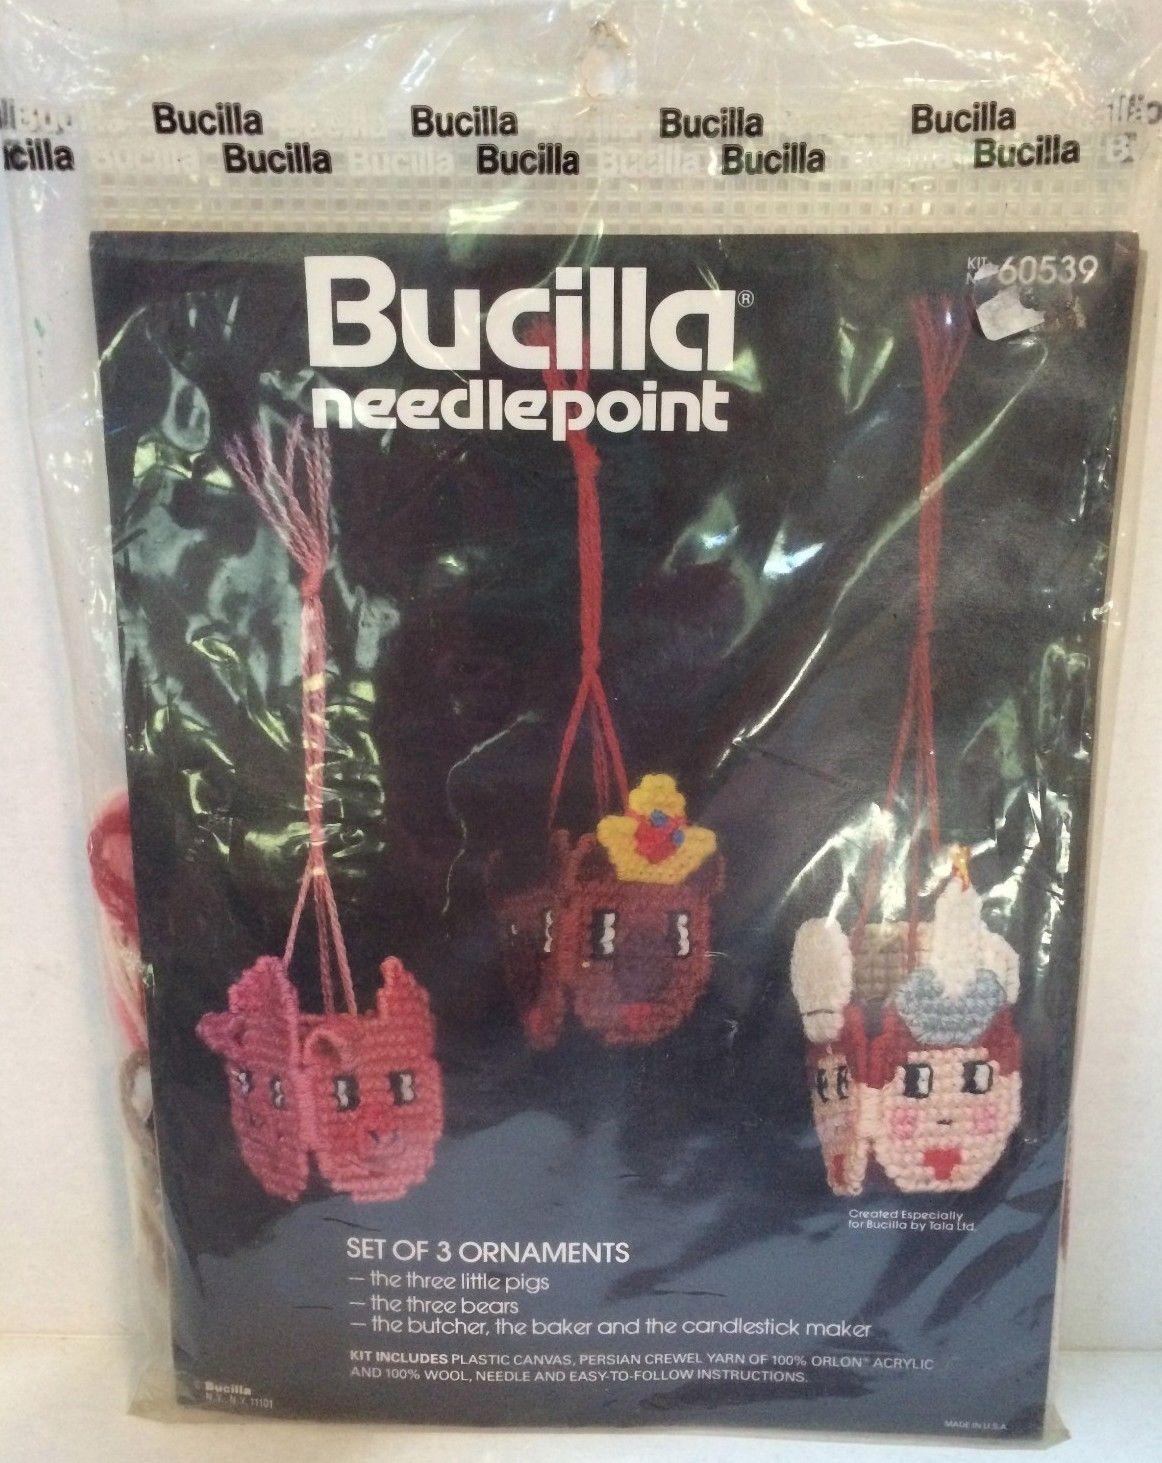 Bucilla Needlepoint Ornaments Kit  3 Pigs, 3 Bears, & More